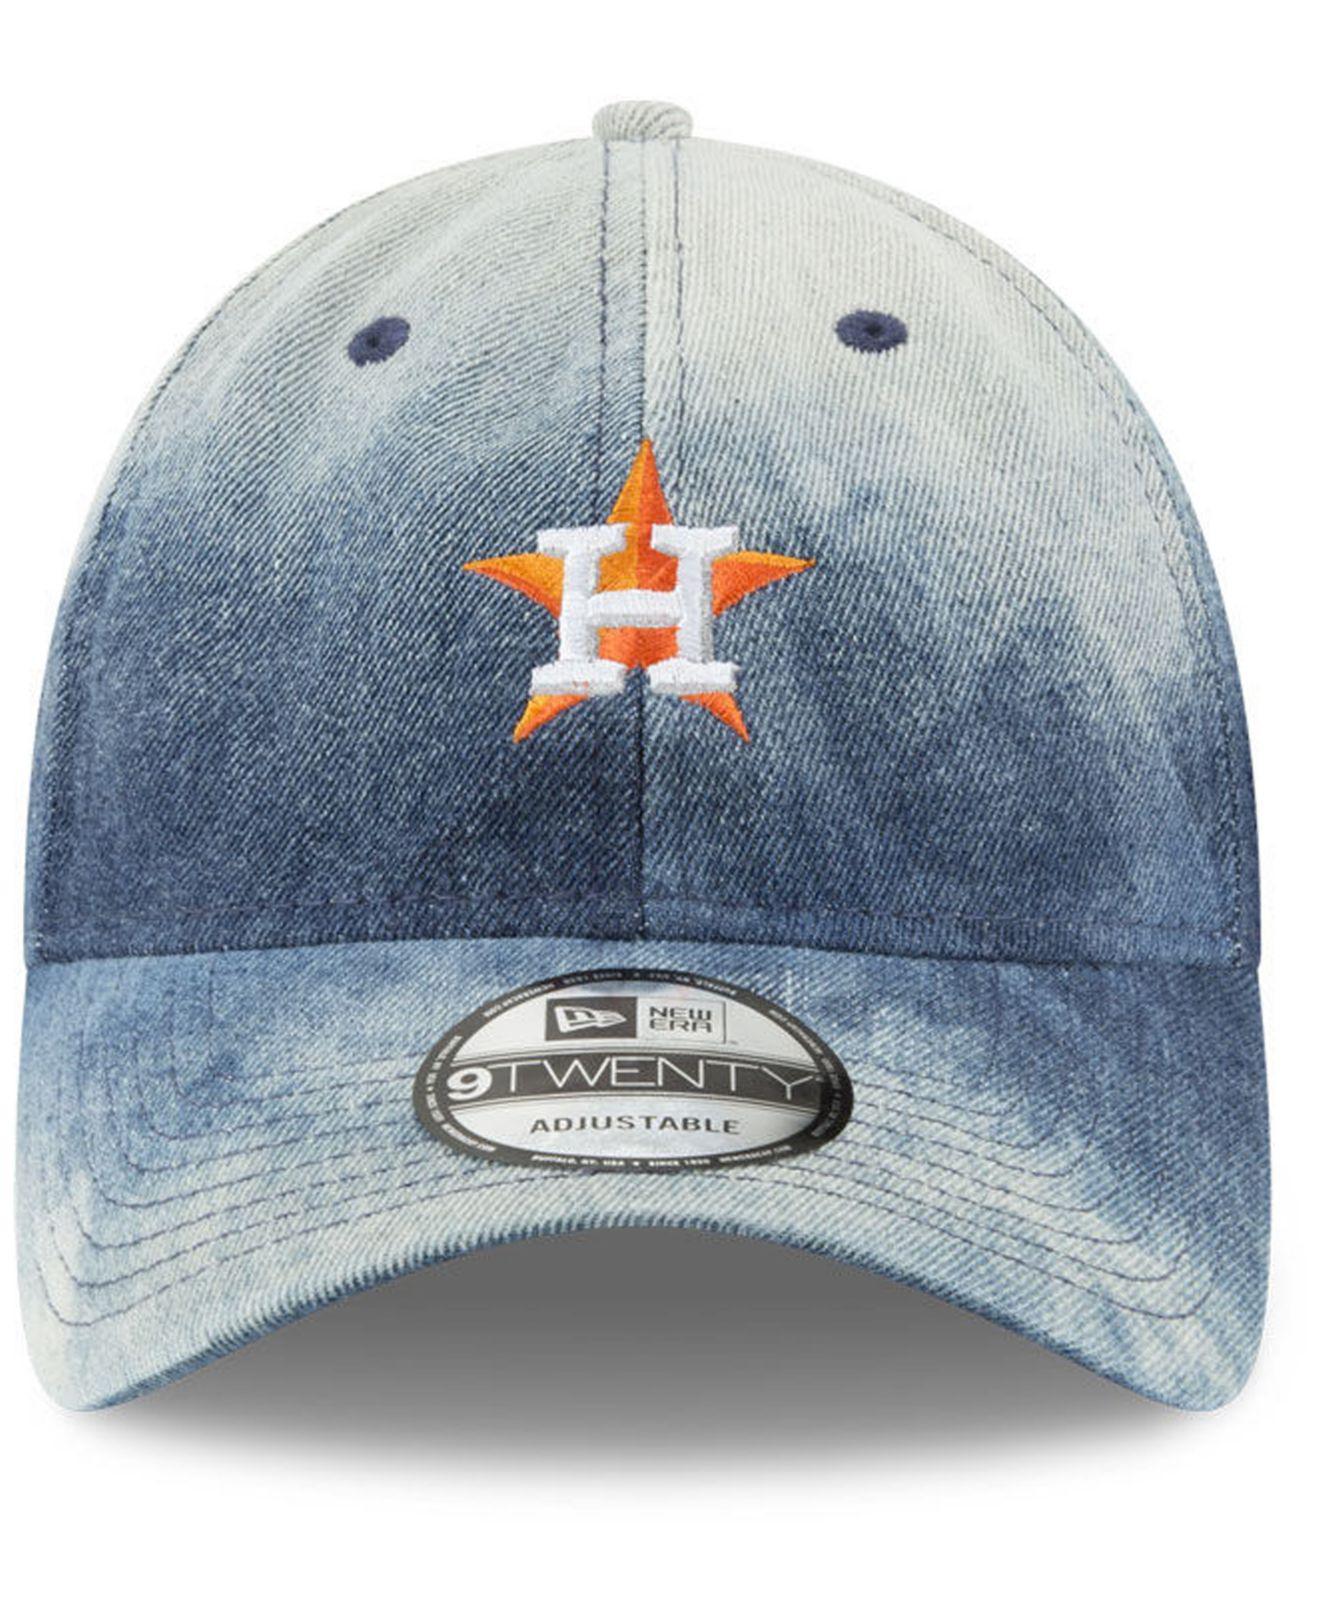 best loved 70749 0a718 ... wholesale lyst ktz houston astros denim wash out 9twenty cap in blue  for men a4c37 617cb